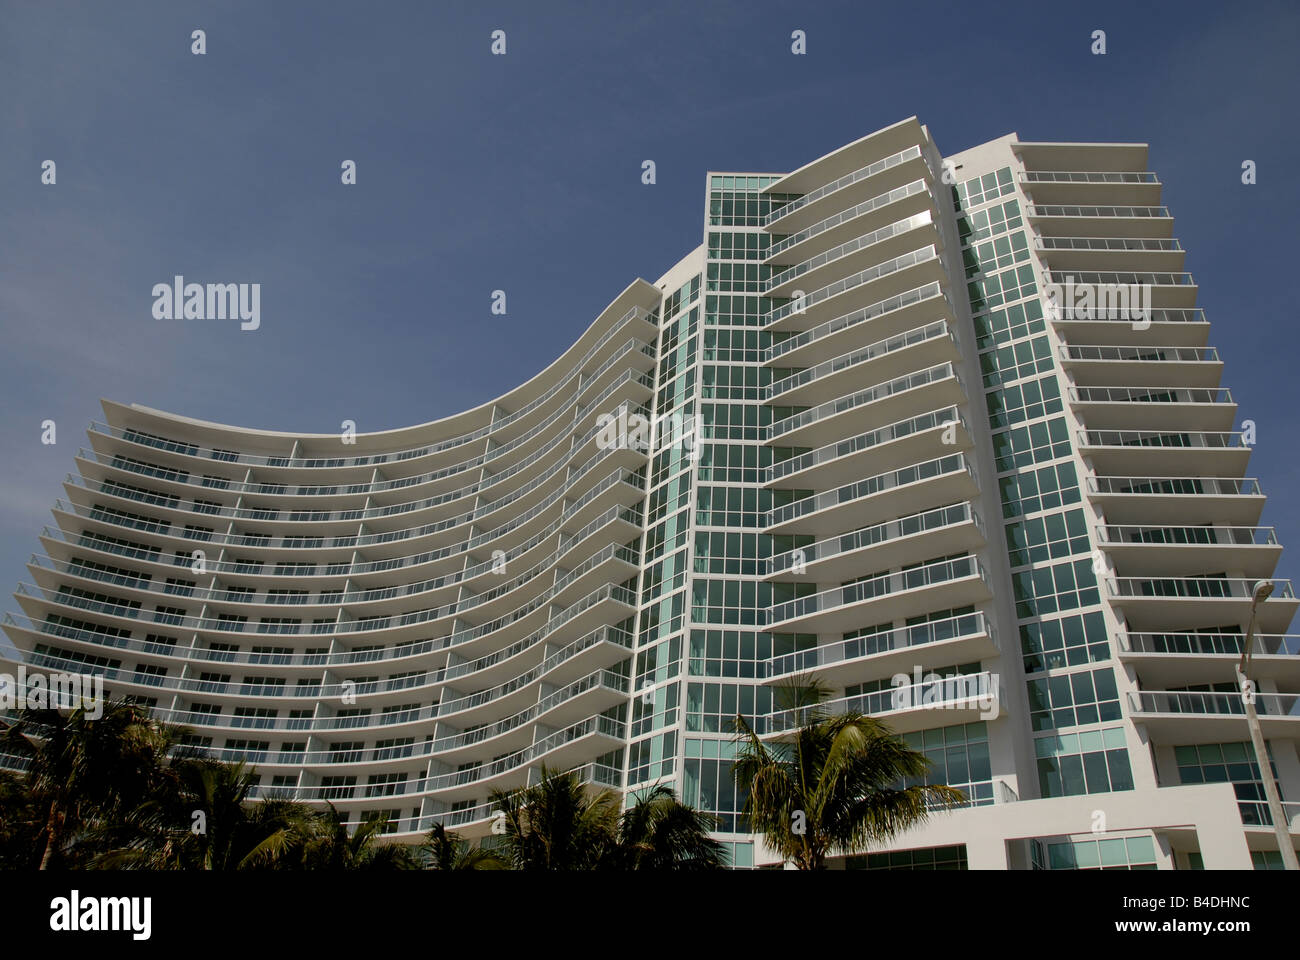 Luxury condominium building in Pompano Beach Florida, USA. - Stock Image